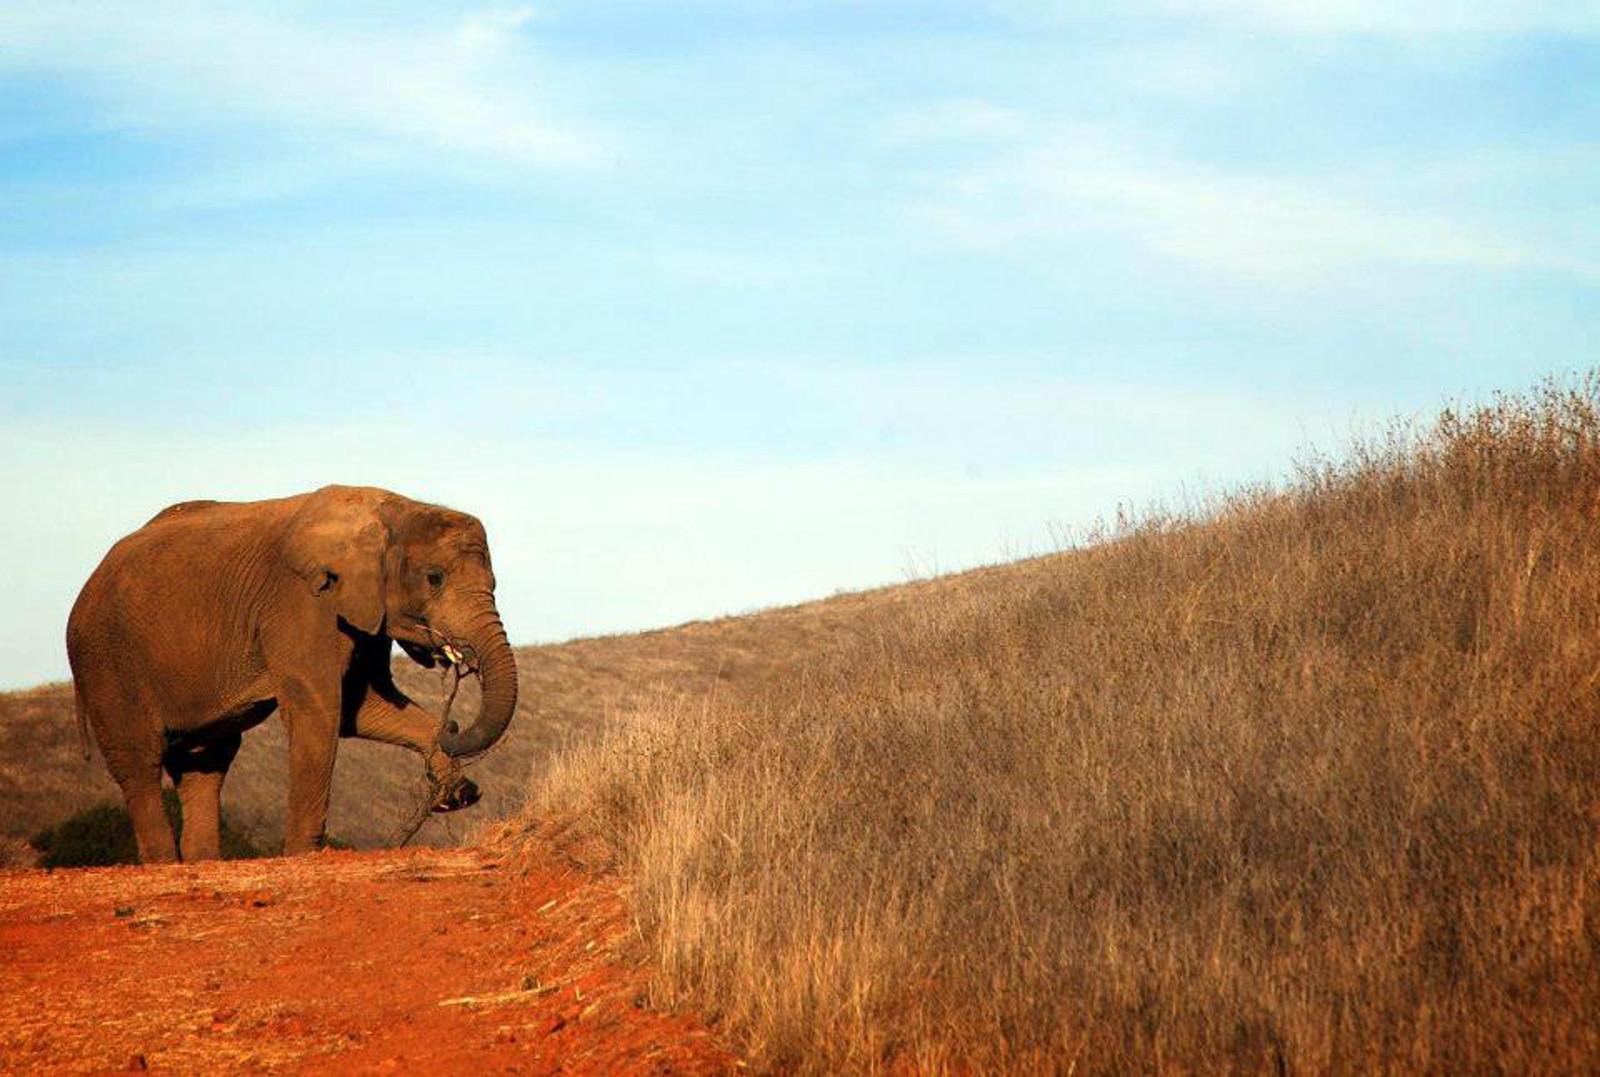 5 Former Zoo Animals That Got Happy Endings at Sanctuaries